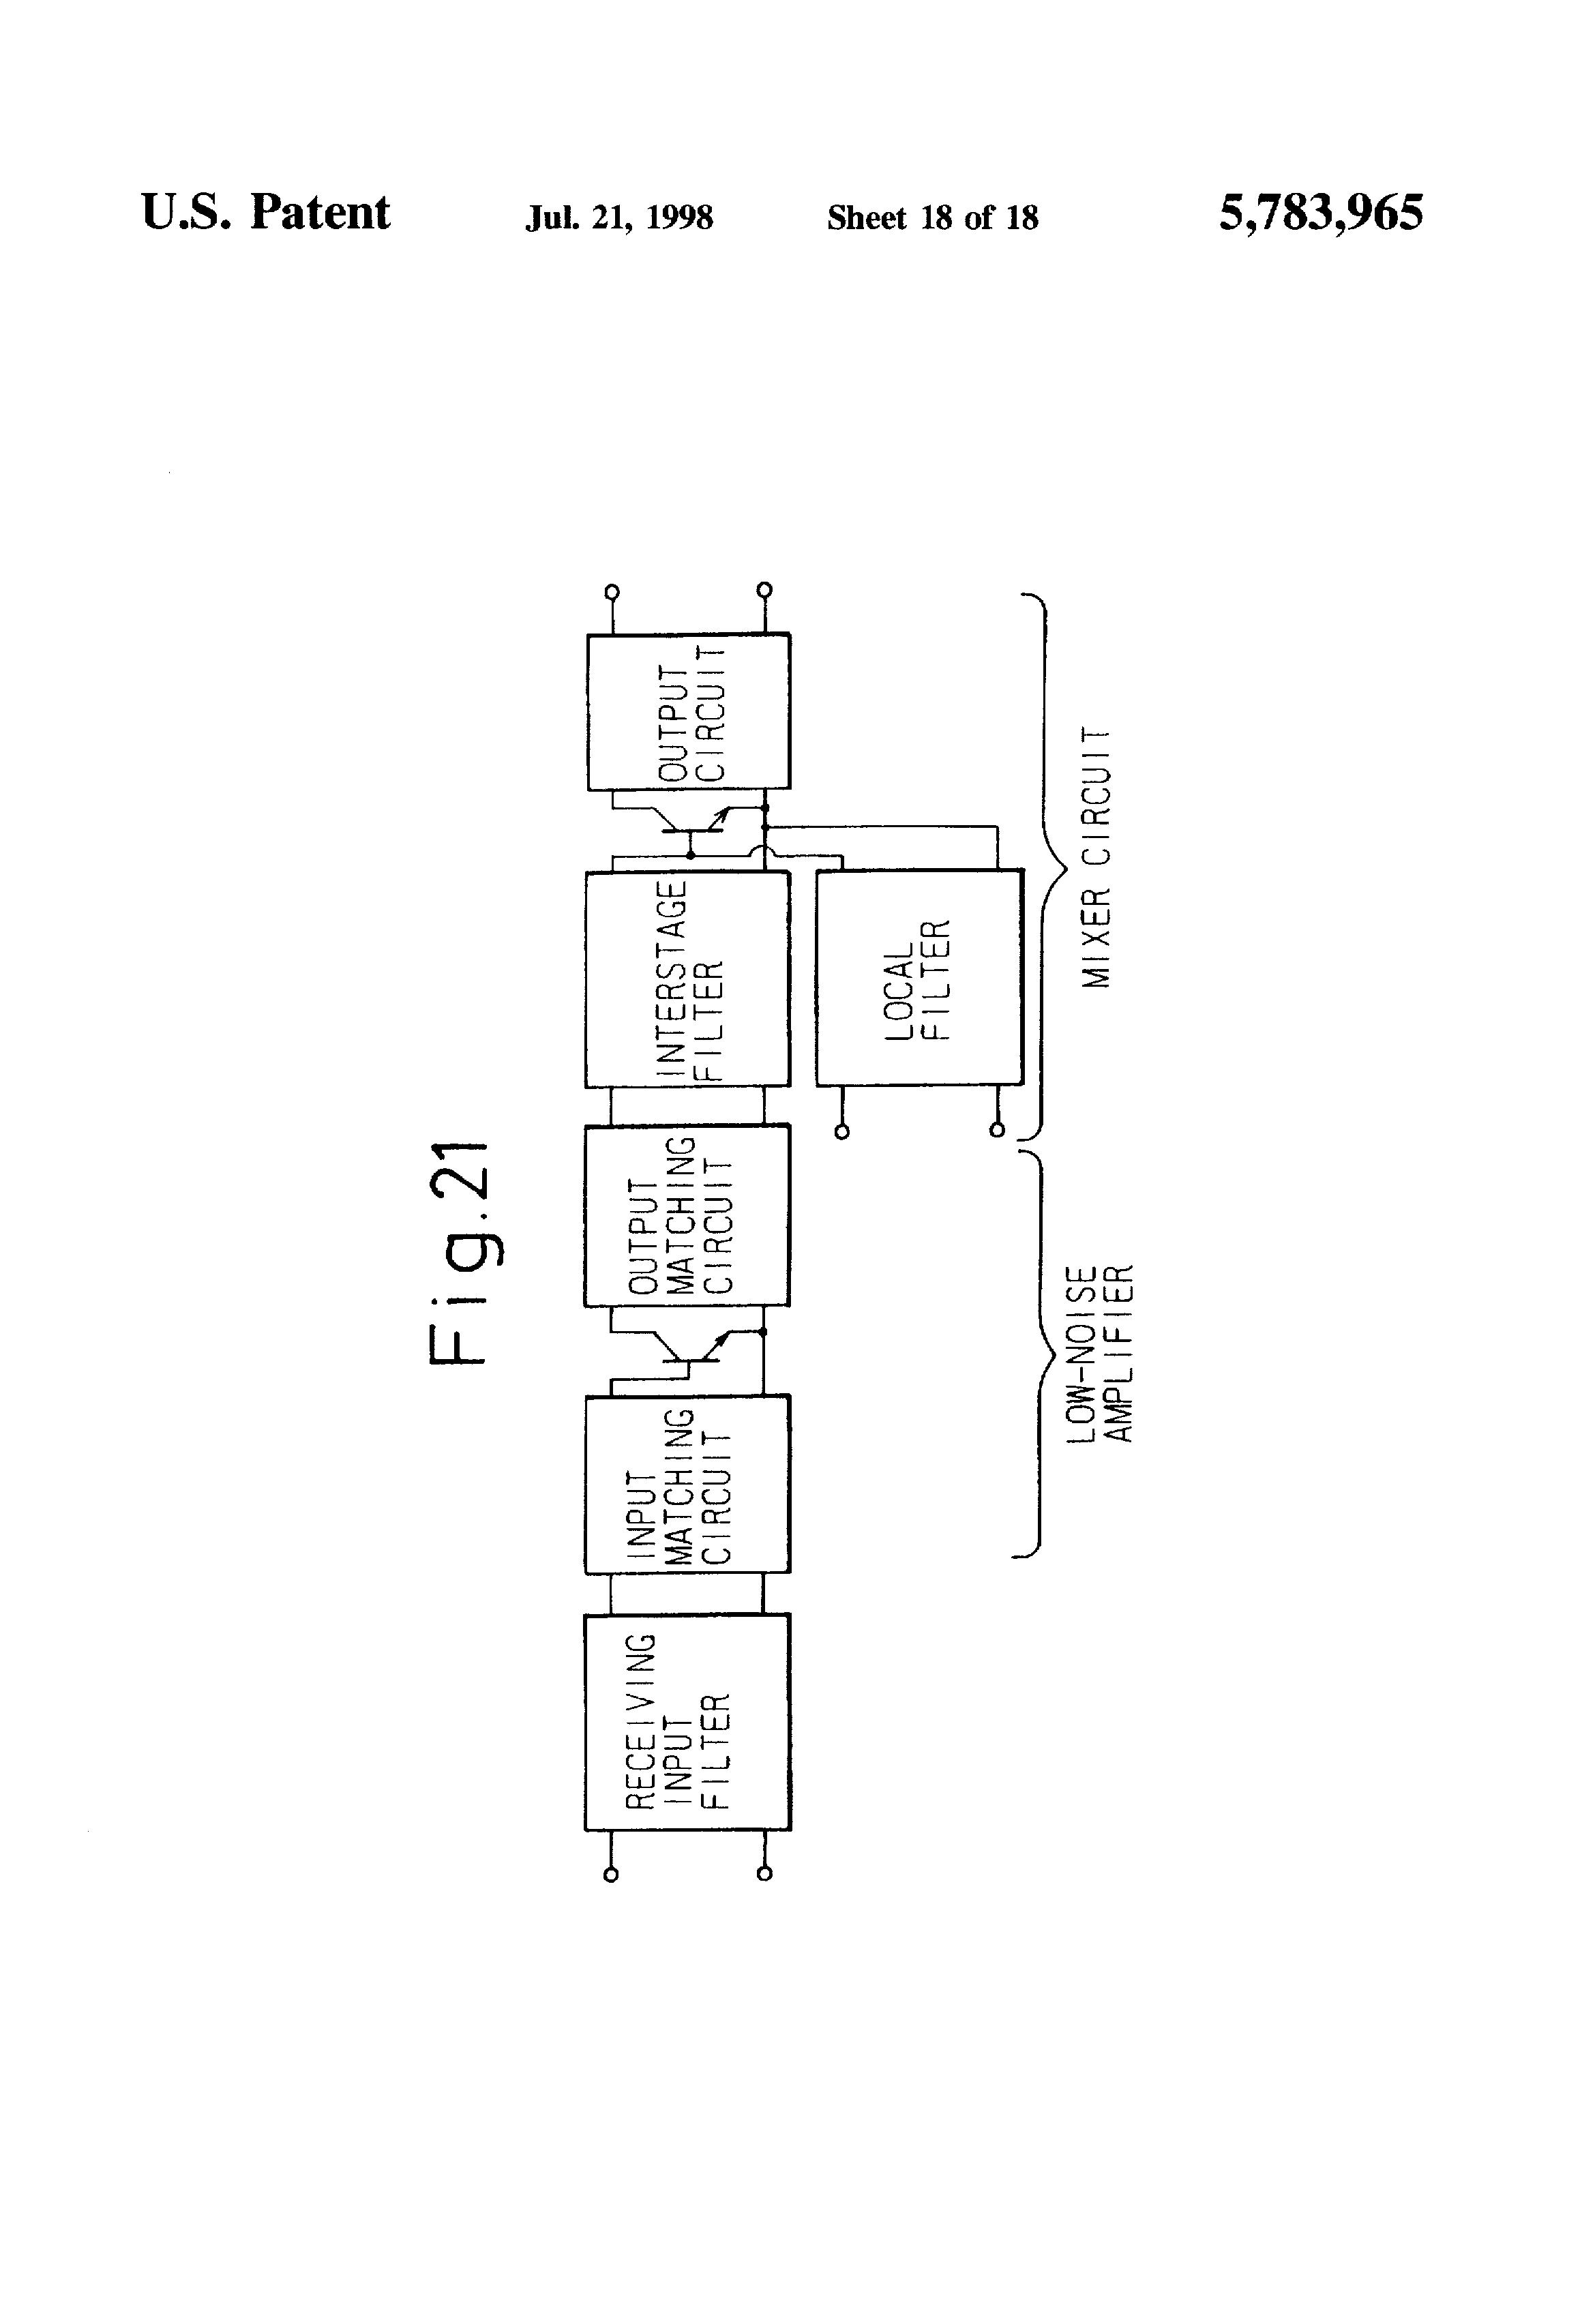 Patente Us5783965 Bias Circuit Google Patentes Bandpass Filter Diagram Basiccircuit Patent Drawing